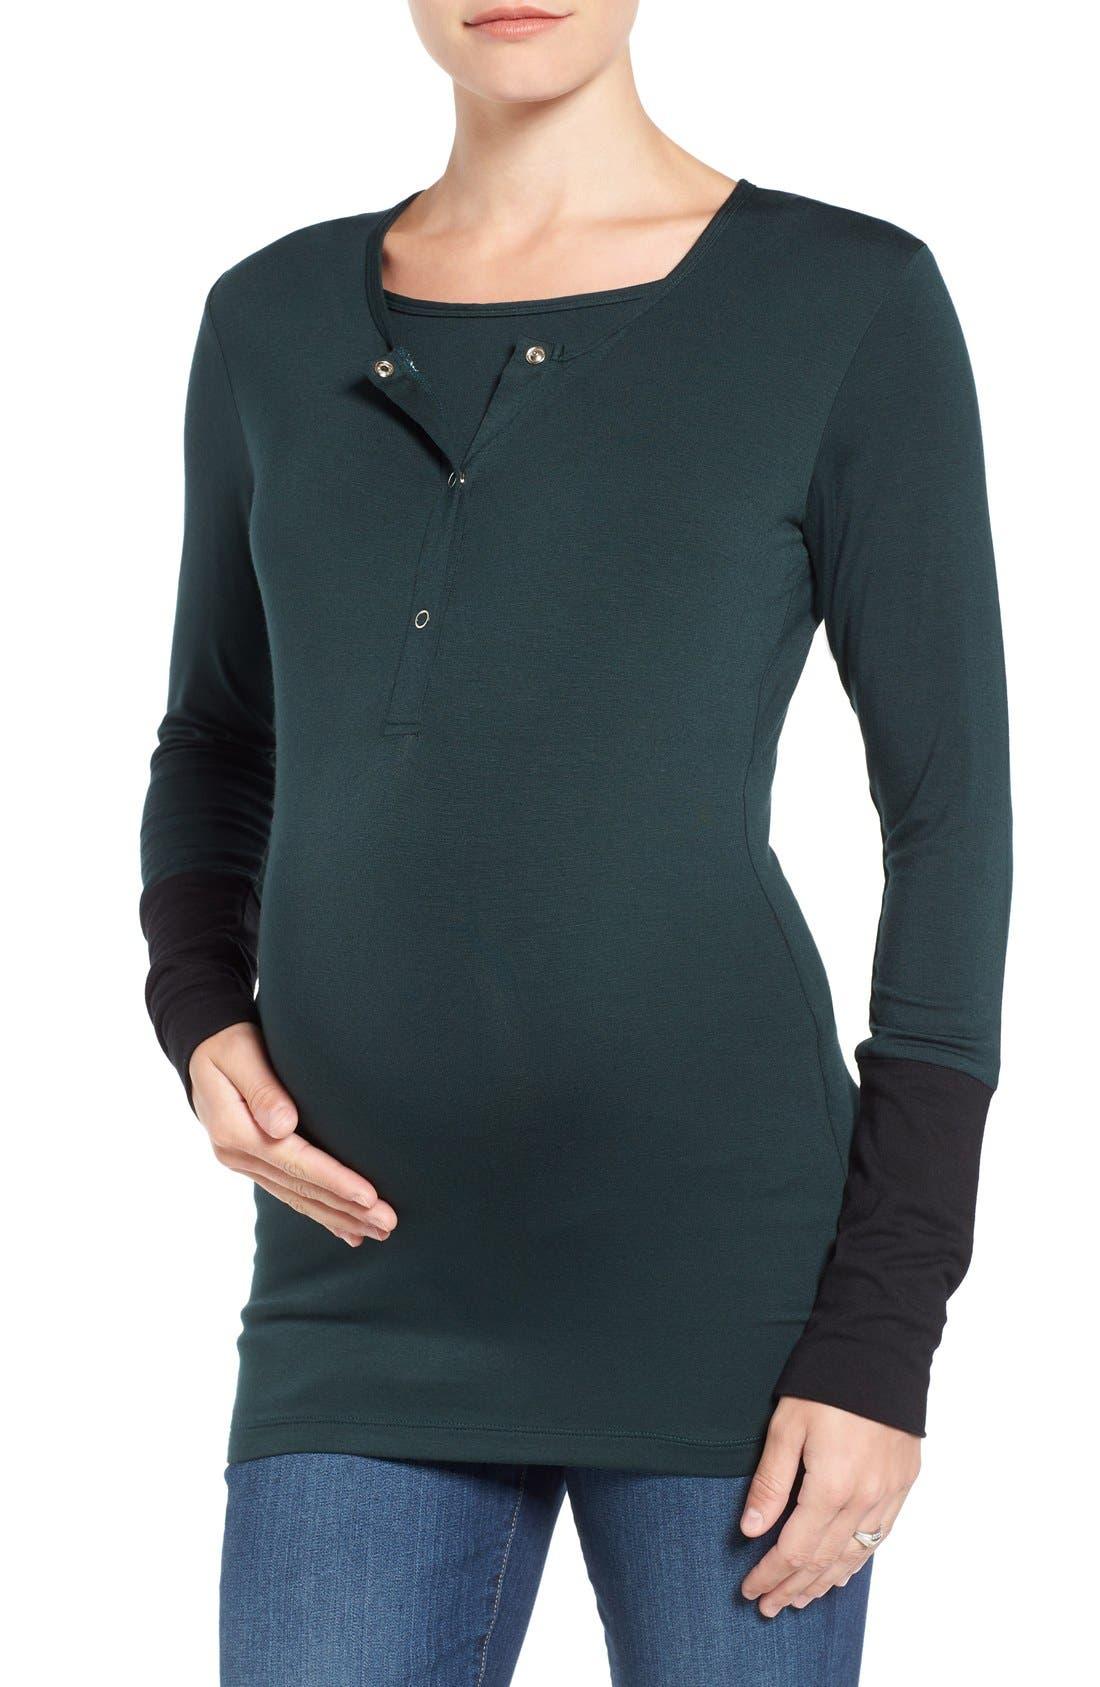 'Jenn' Maternity/Nursing Top,                         Main,                         color, Hunter W/ Black Cuff